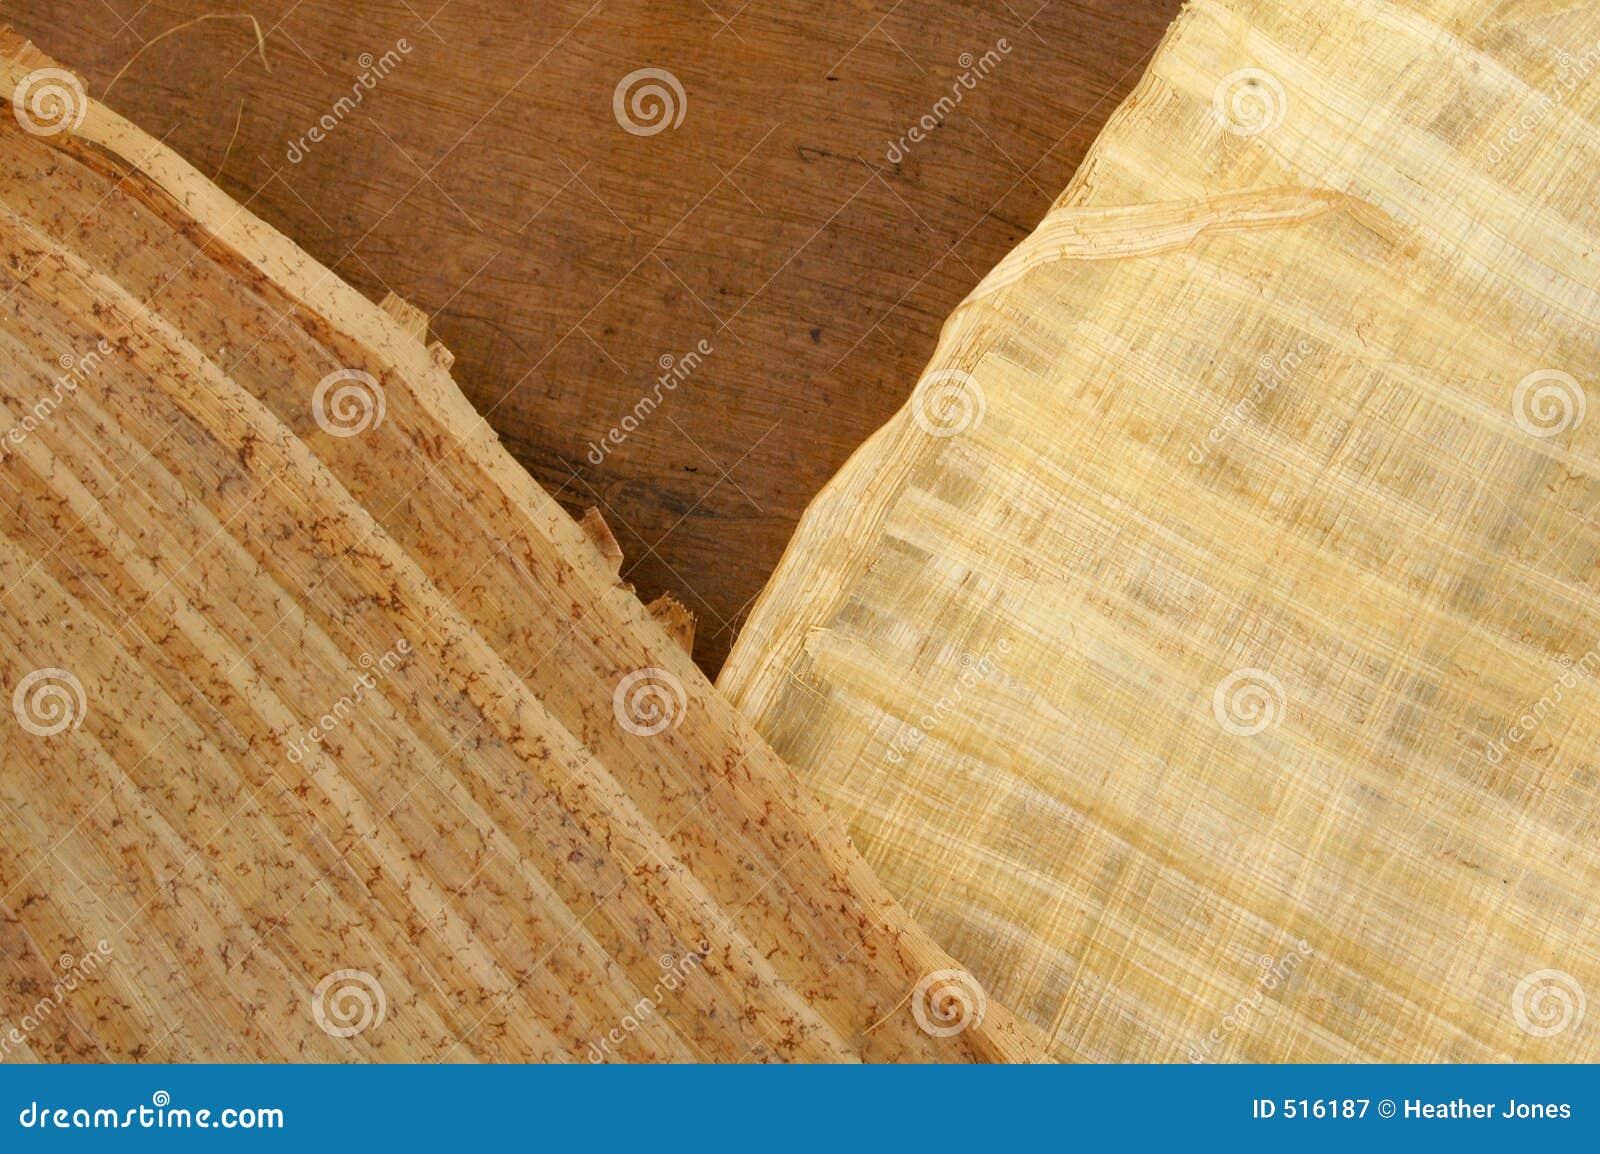 9 papper mönstrat trä